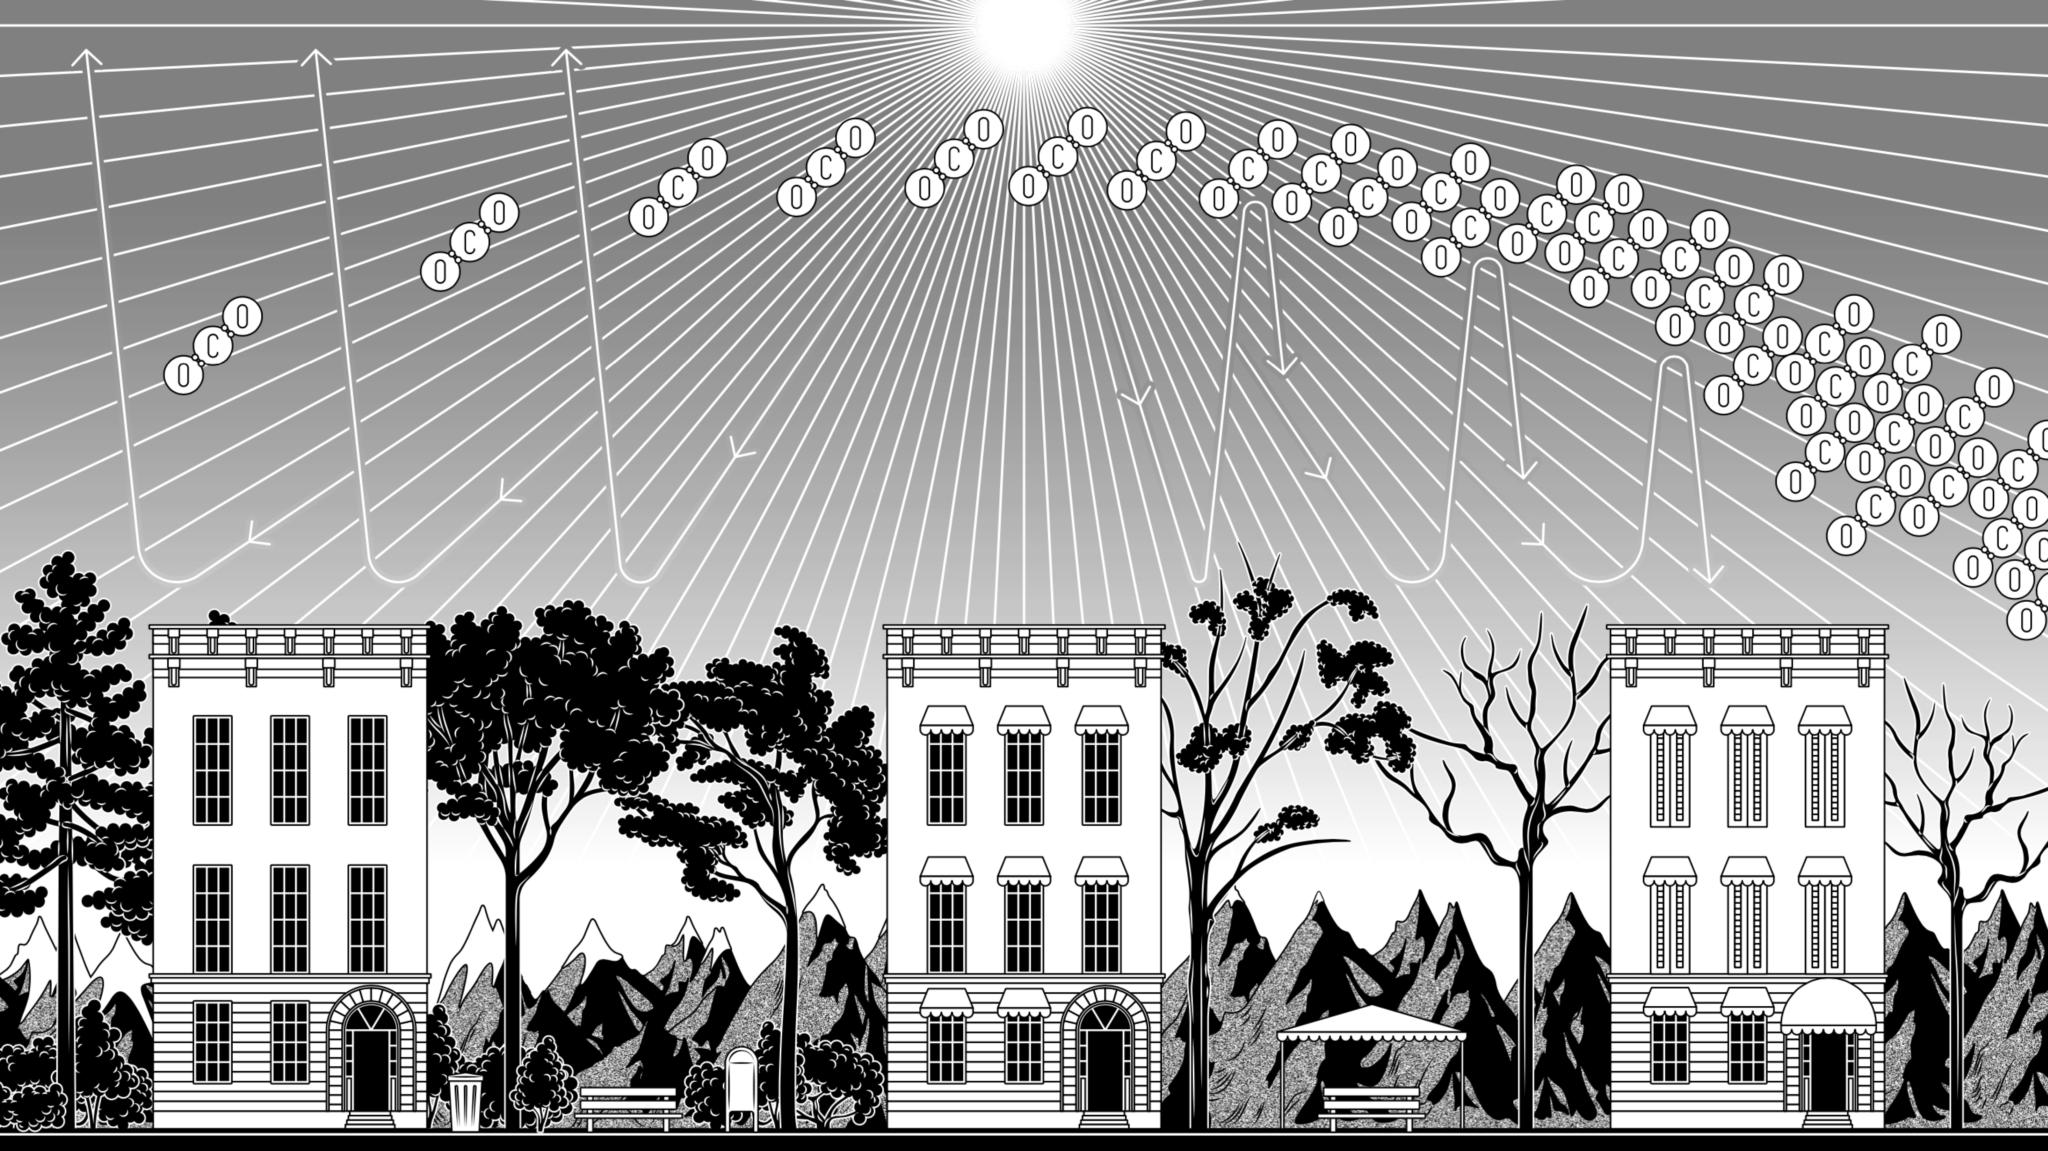 Illustration demonstrating the greenhouse effect